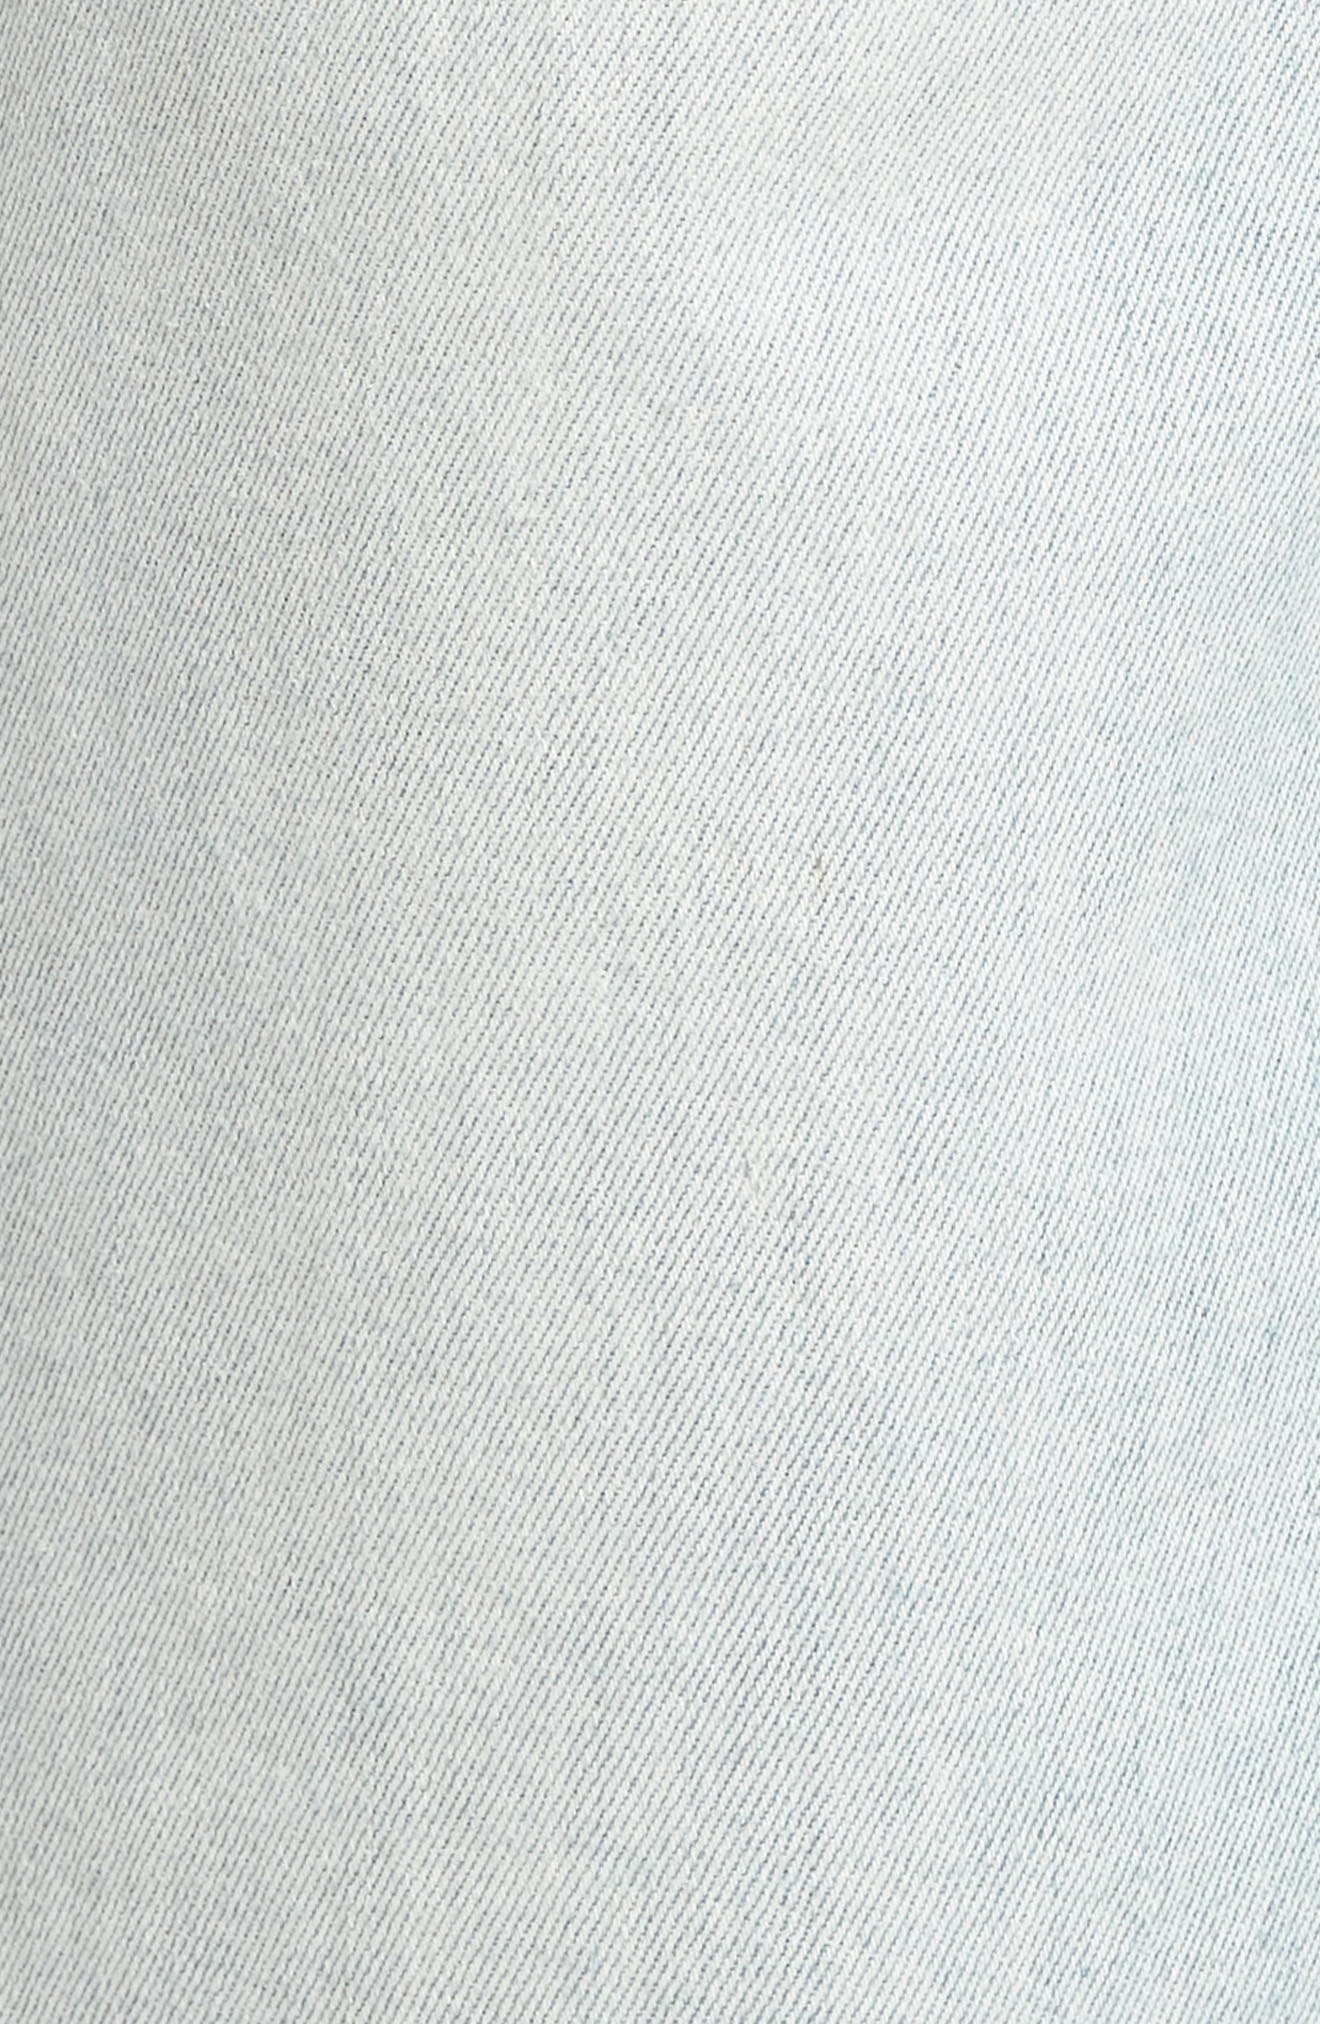 Holly High Waist Released Hem Crop Wide Leg Jeans,                             Alternate thumbnail 6, color,                             460